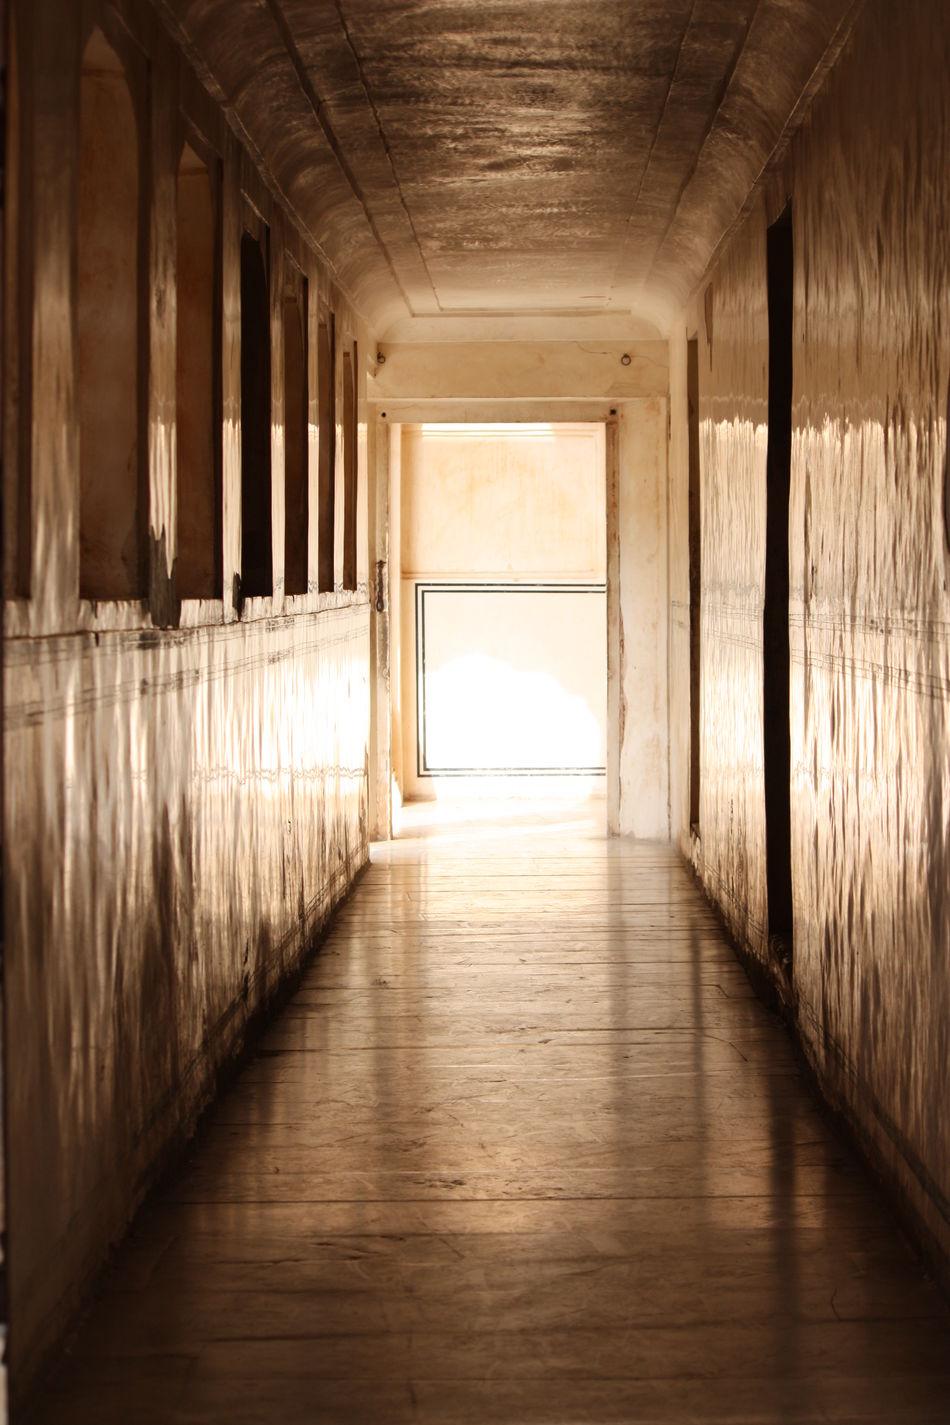 Corridor in Amber Fort, Jaipur, India Amber Fort Corridor Depth Of Field Diminishing Perspective Empty Empty Corridor Hallway Interior No People Travel Travel Photography